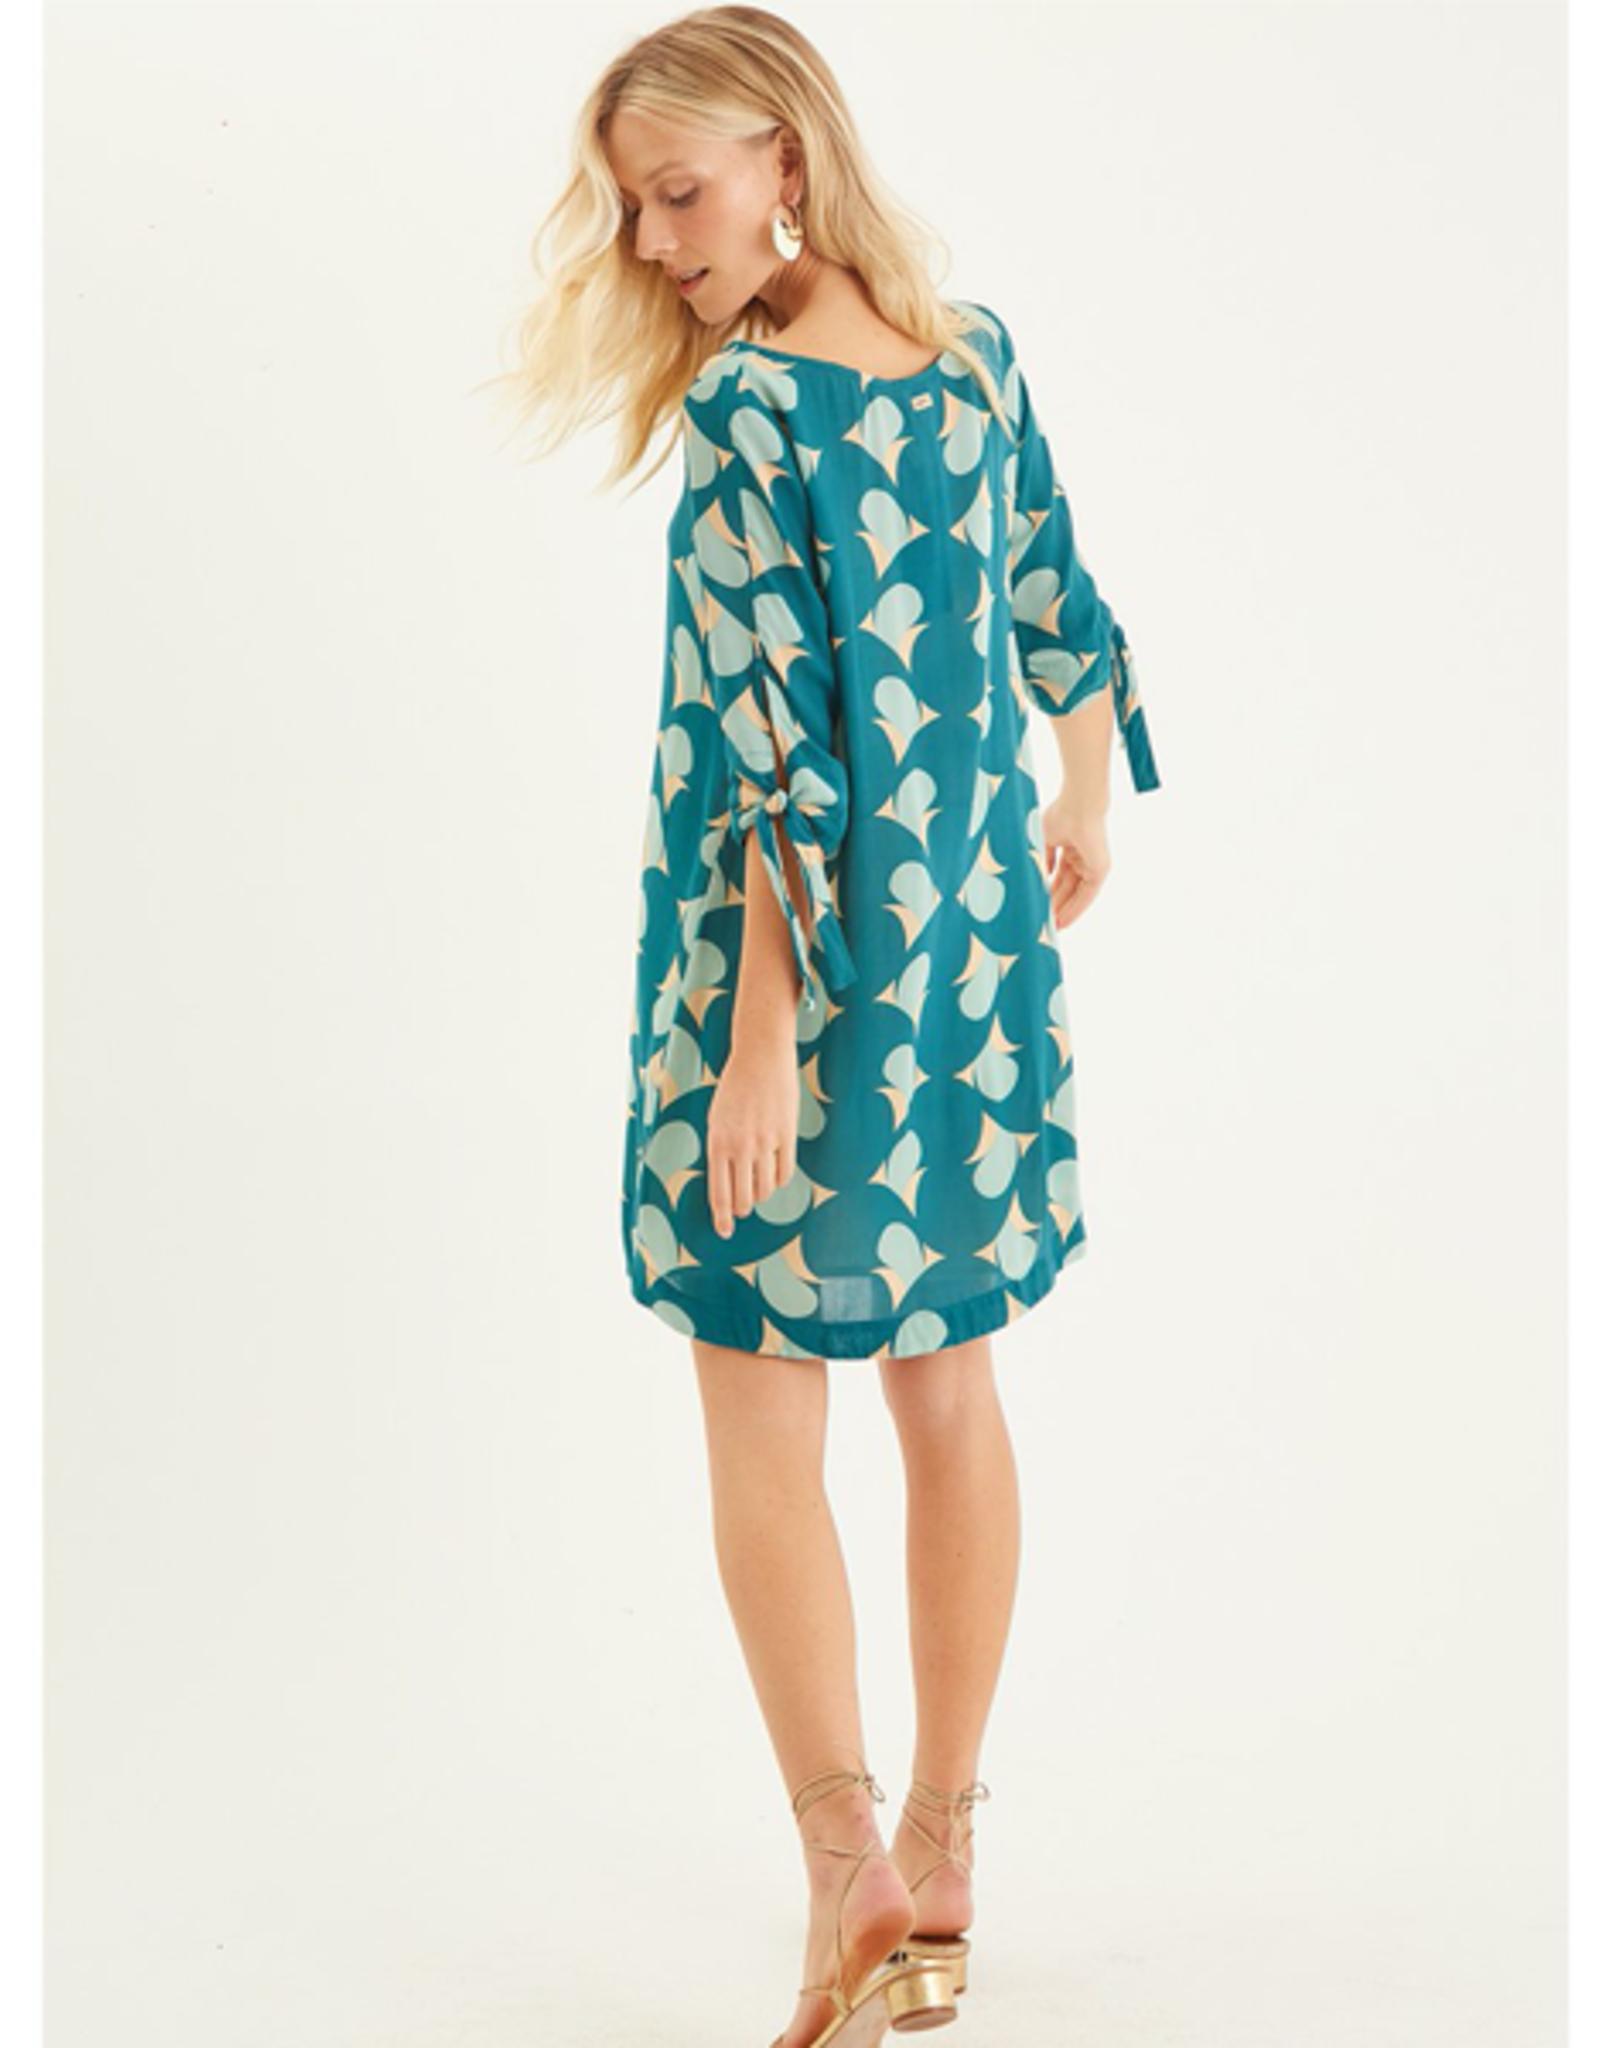 Totem Bogo Dress in Paradise Green